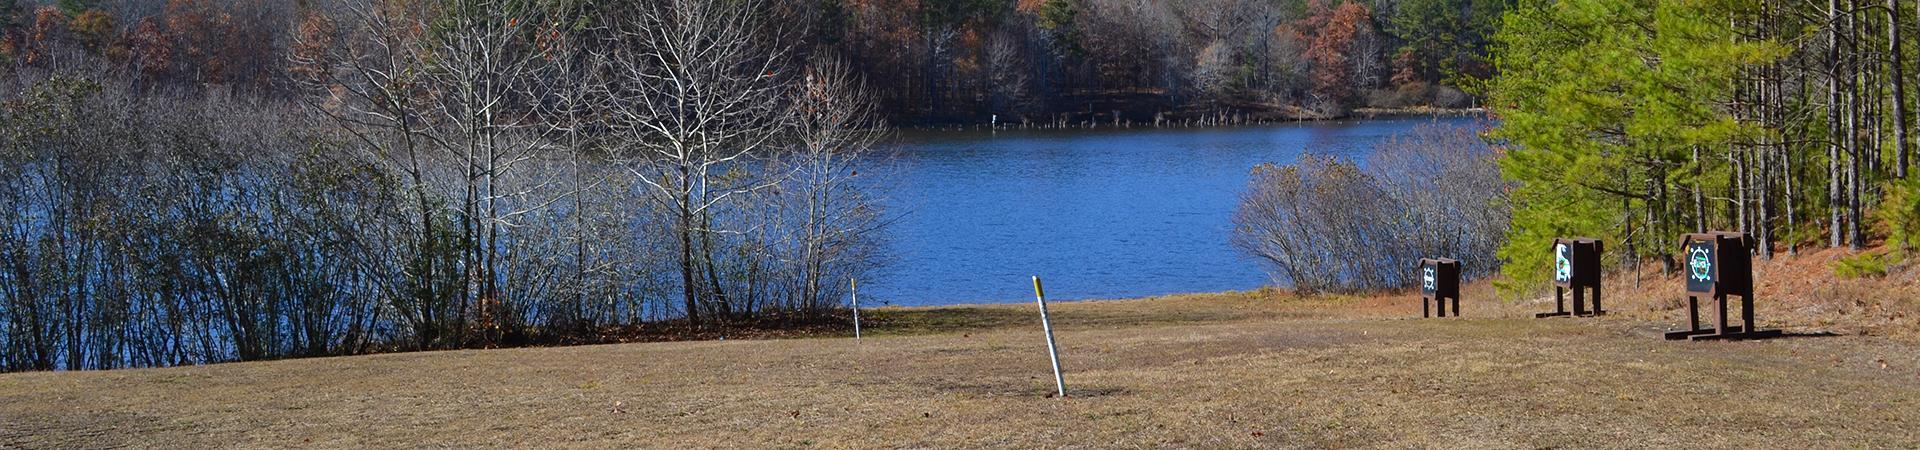 static targets at archery range